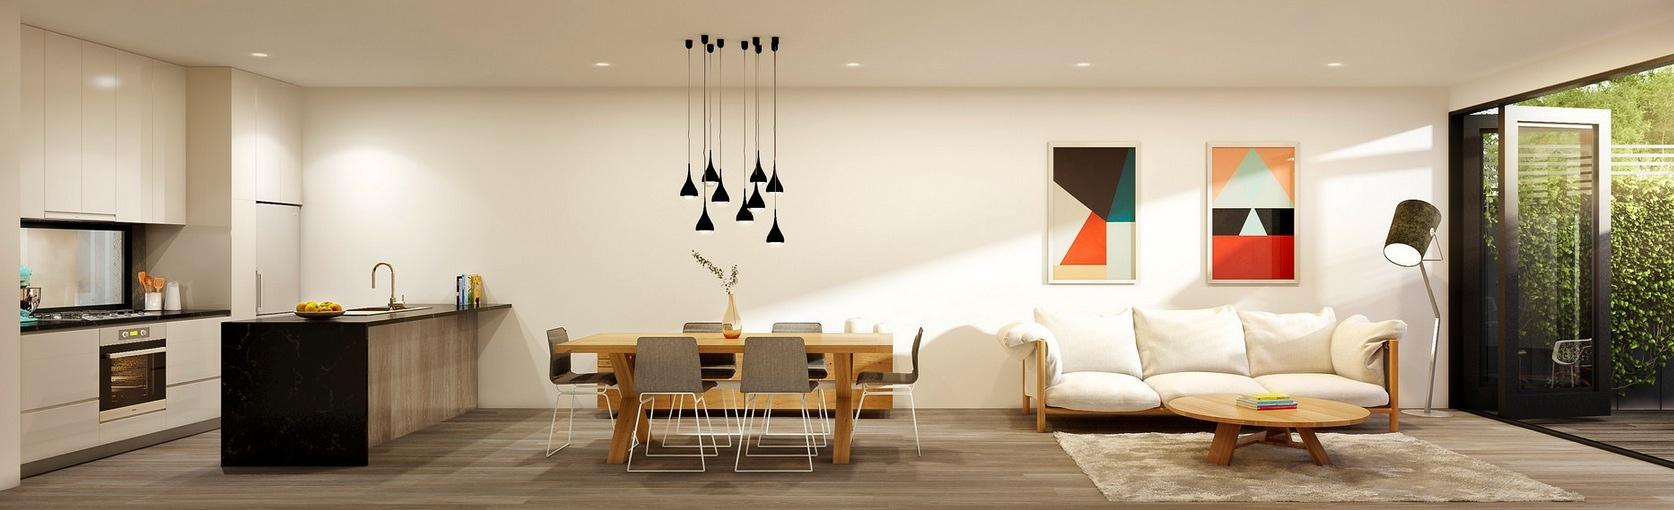 white minimalist open plan design